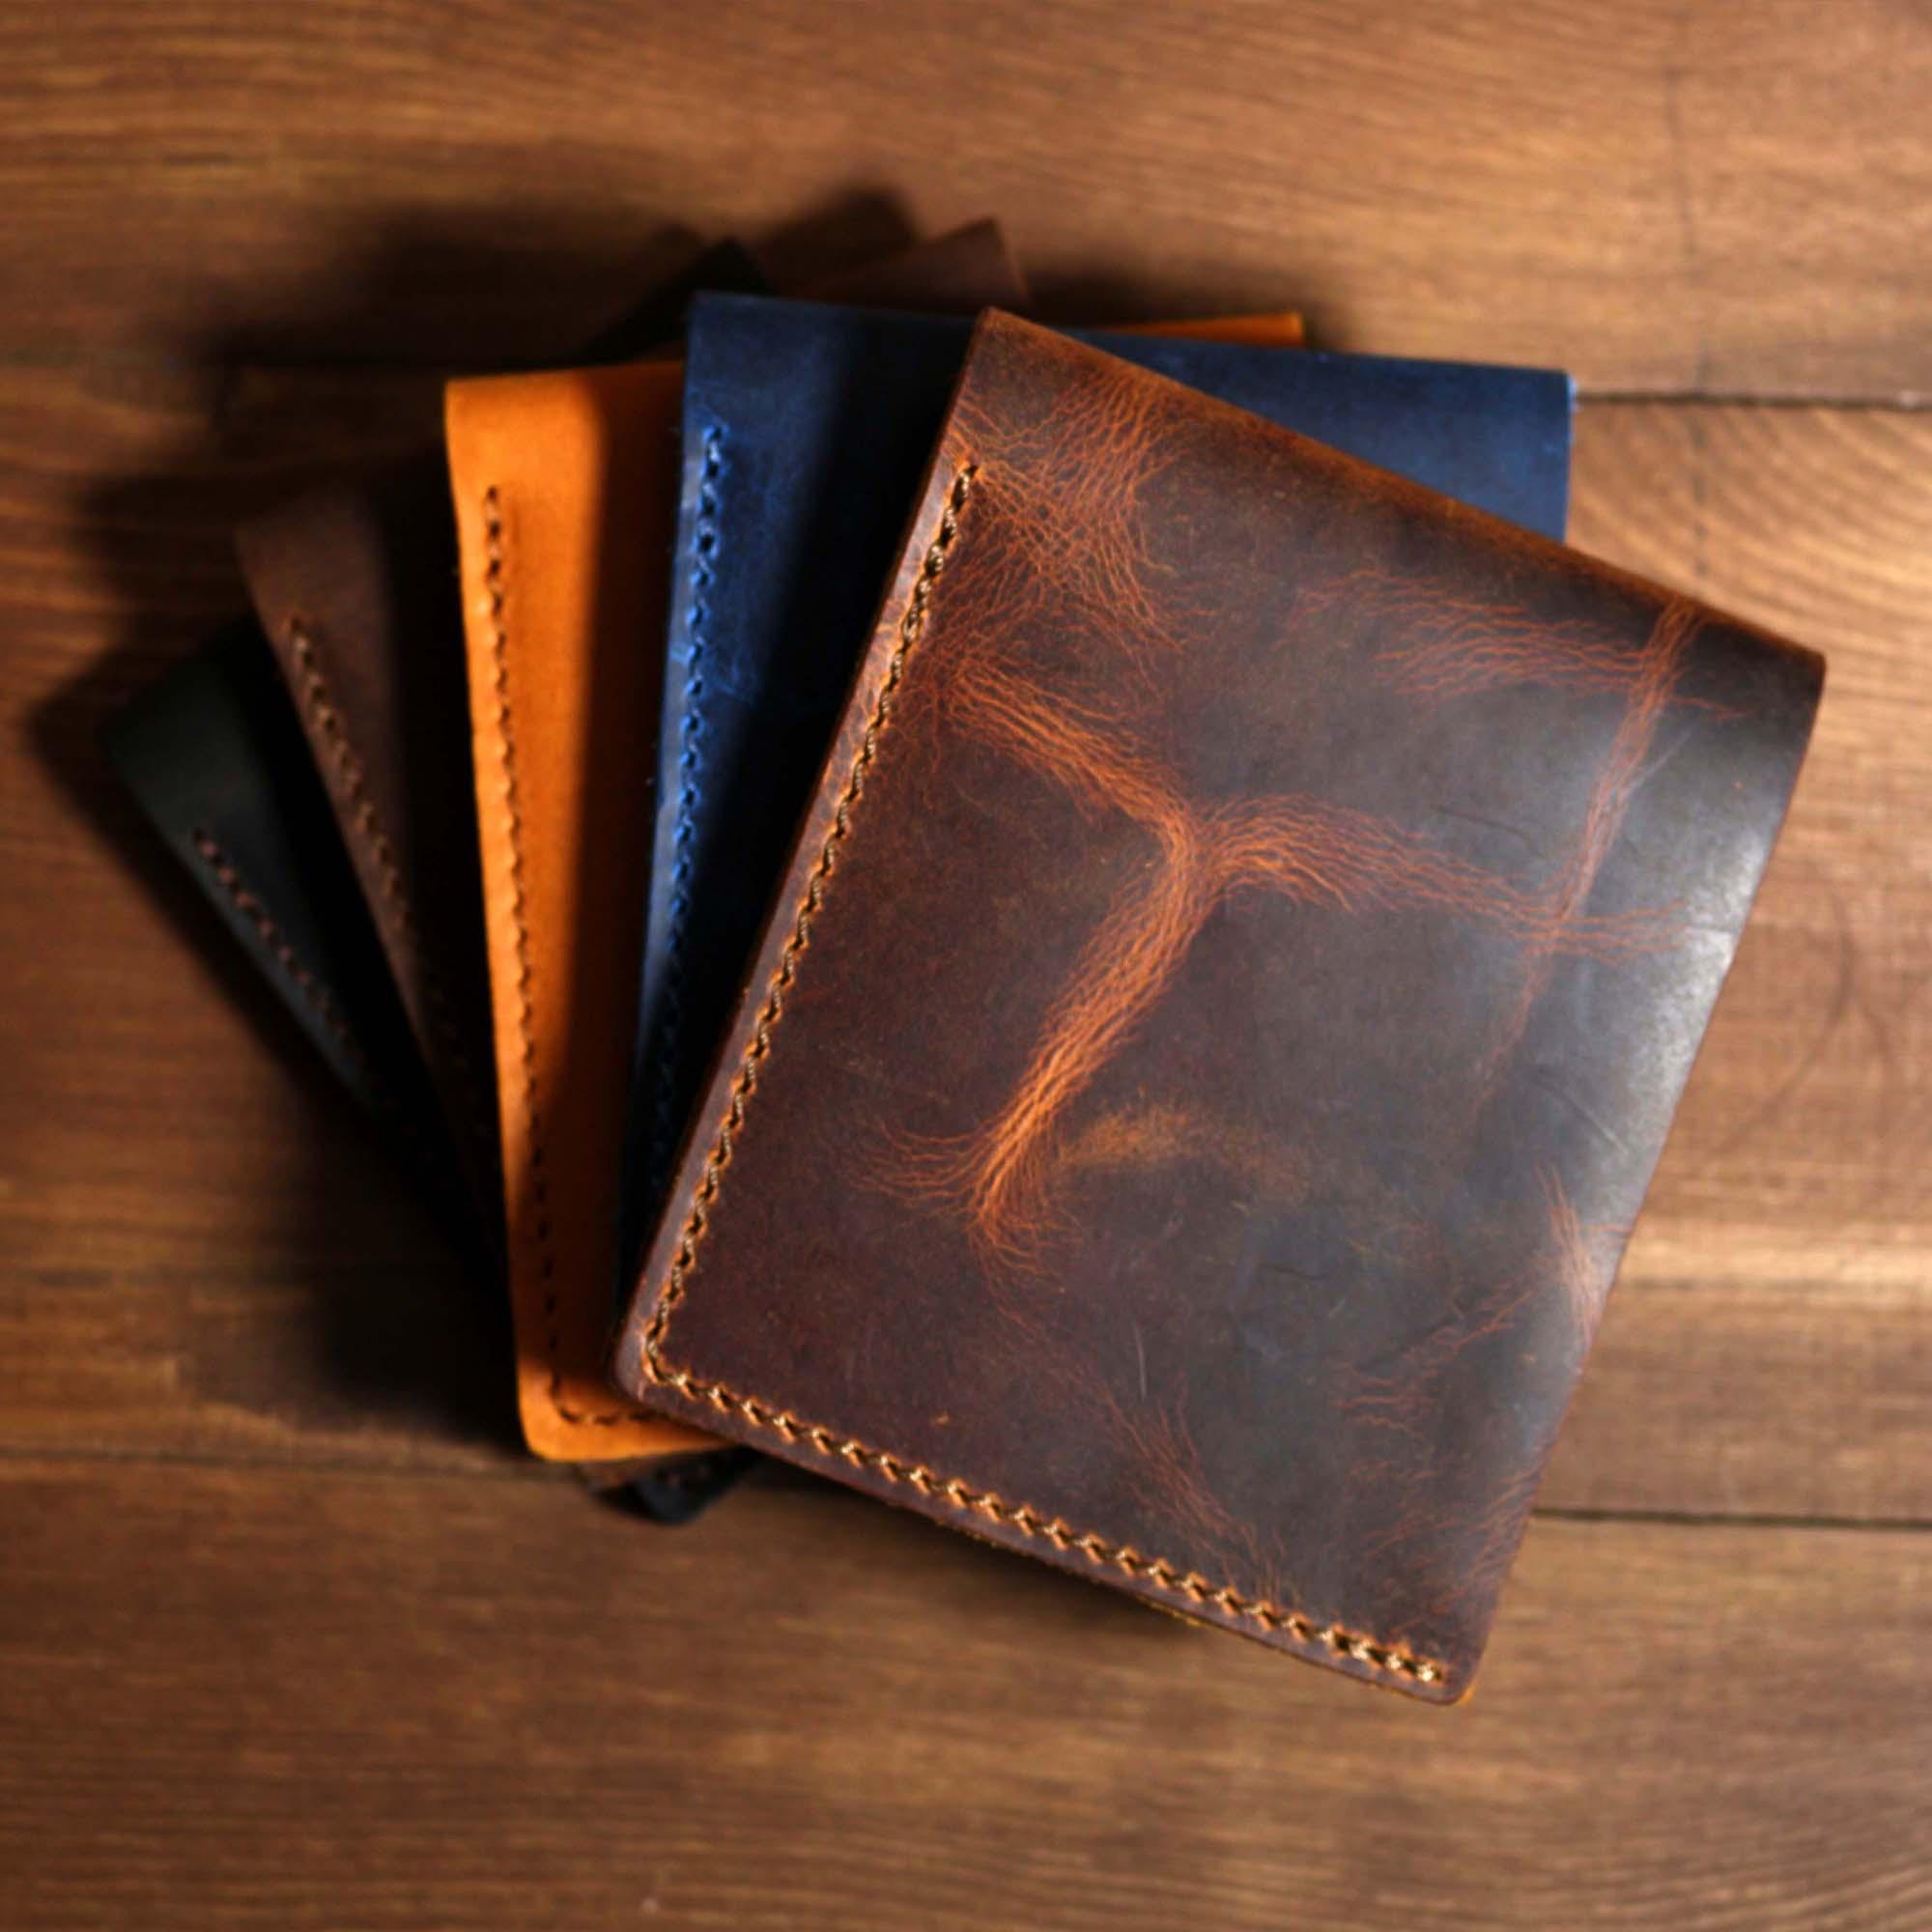 Valuaes Neretva اليدوية الكلاسيكية محفظة جلد طبيعي مرقع 2021 قمة الموضة جودة حامل بطاقة محفظة الذكور مخلب خمر